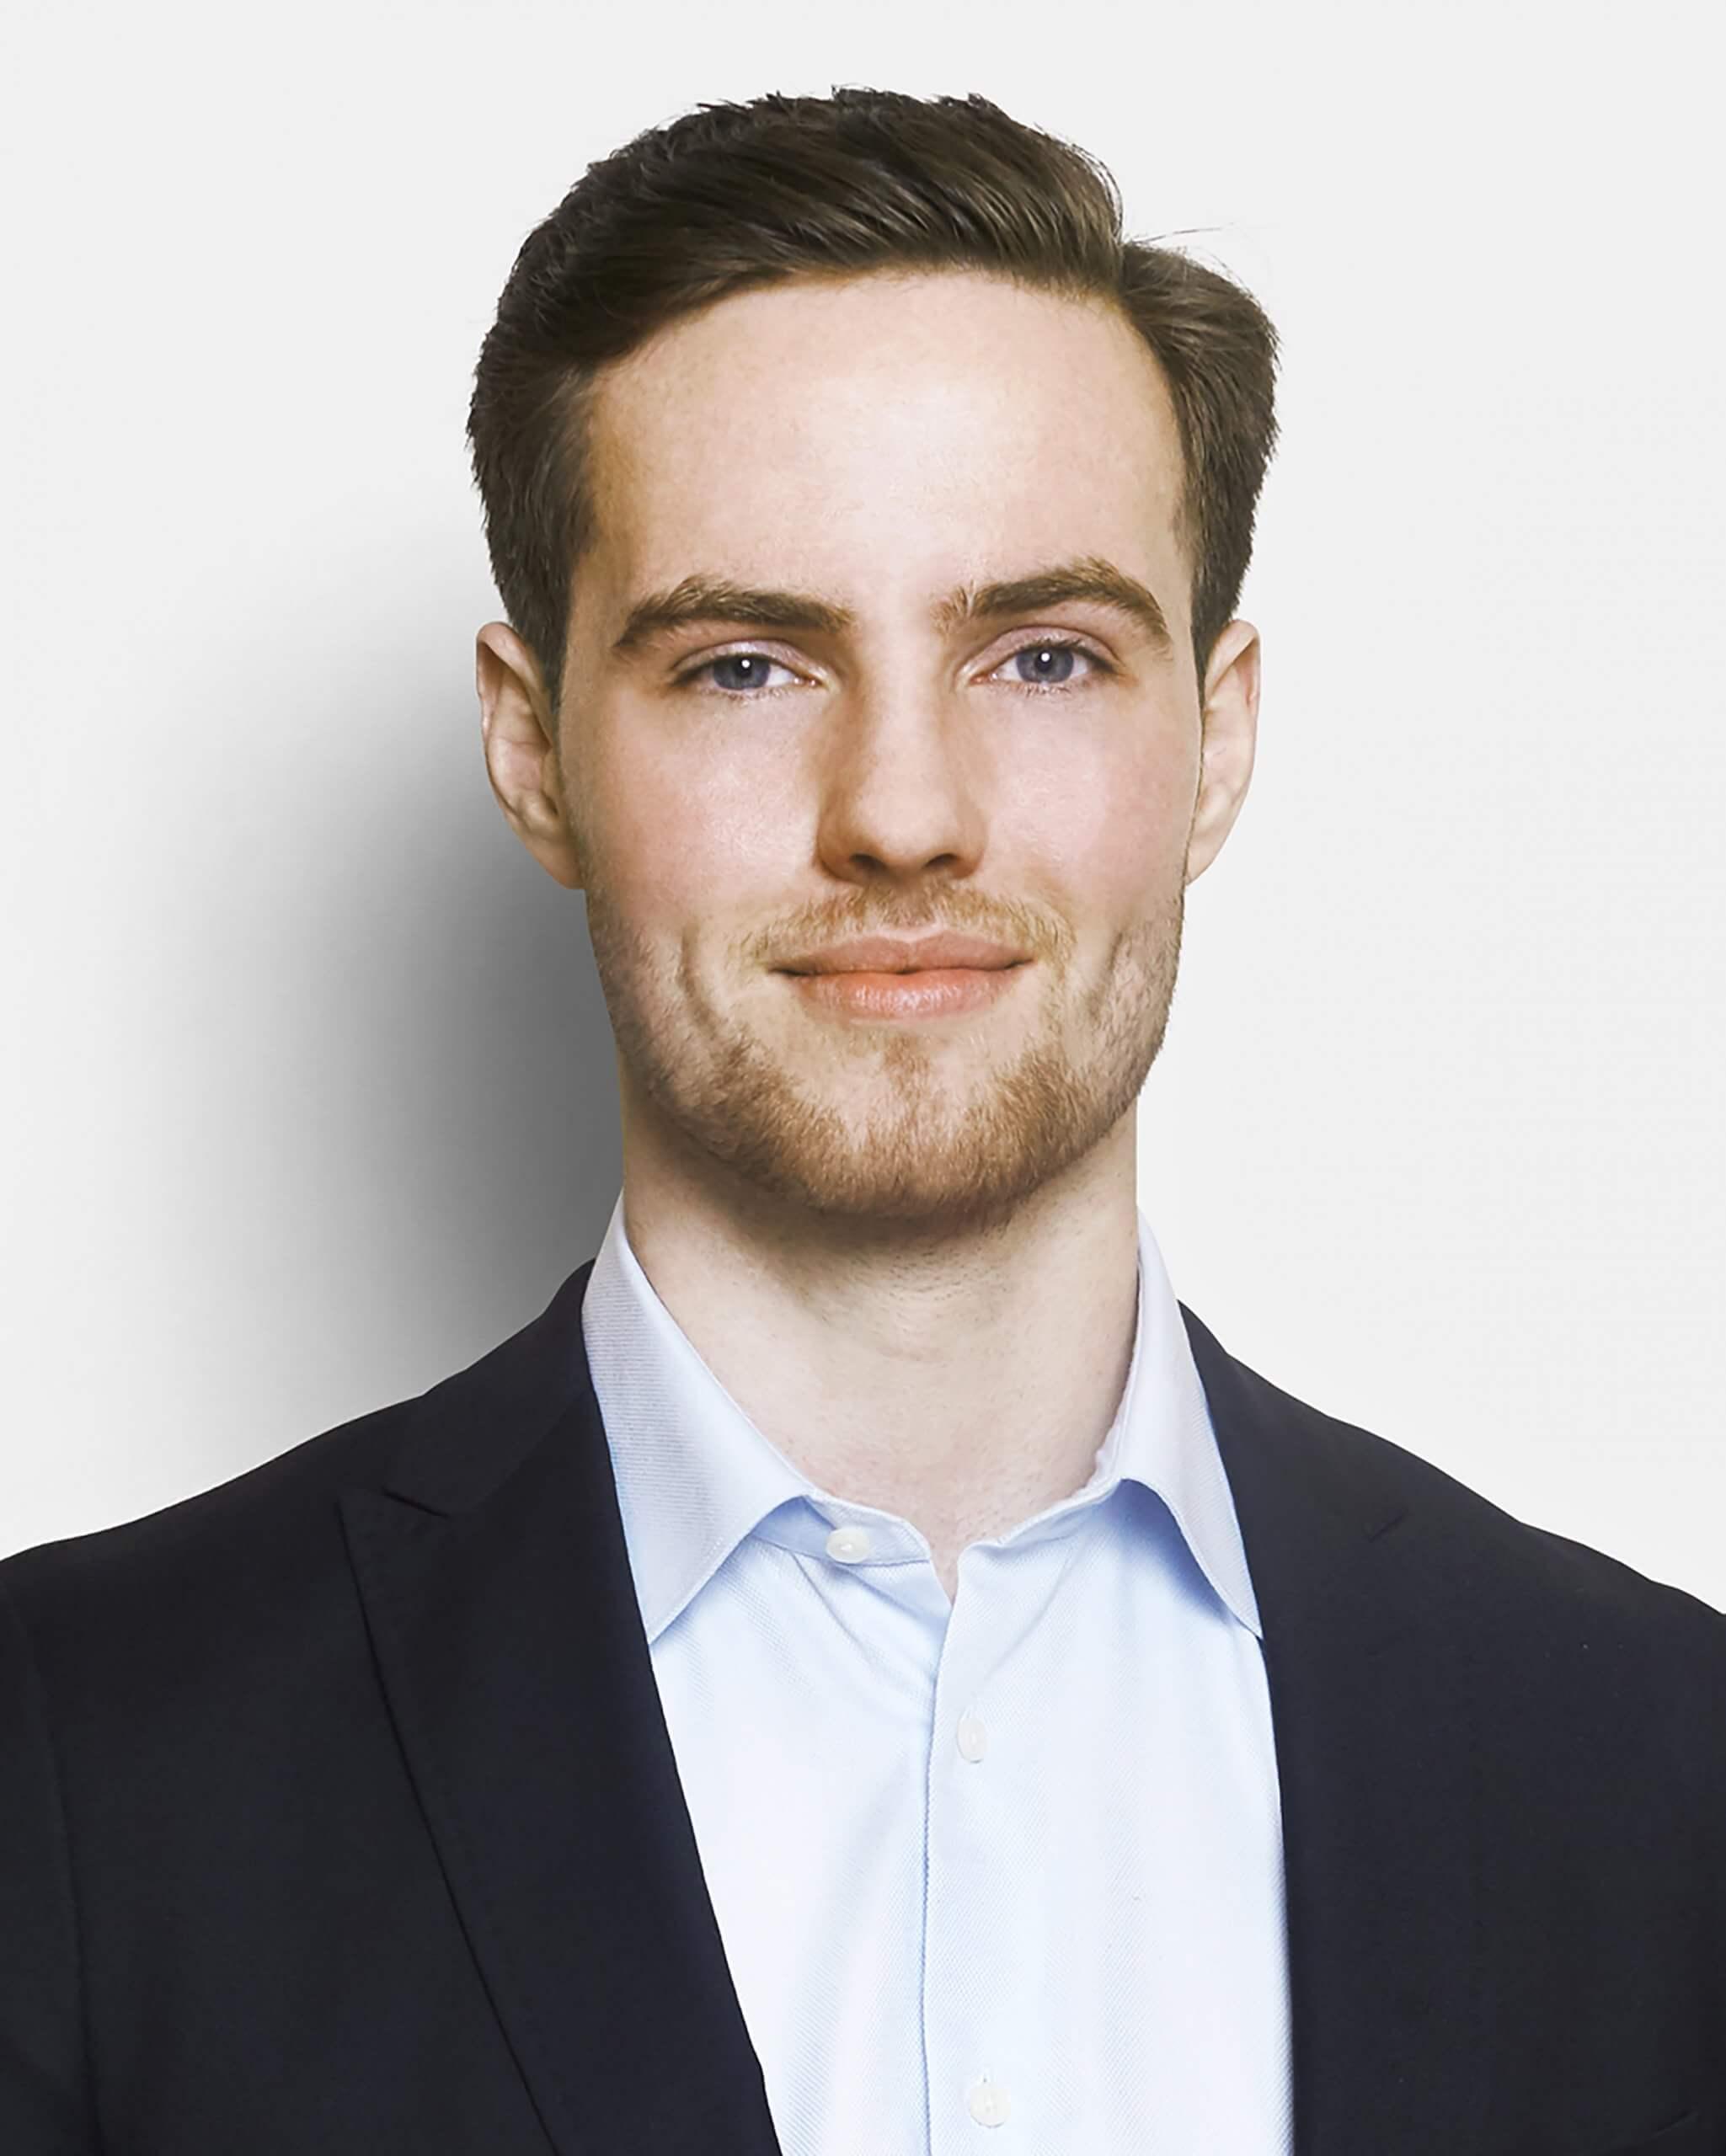 Andreas Juhl Jakobsen